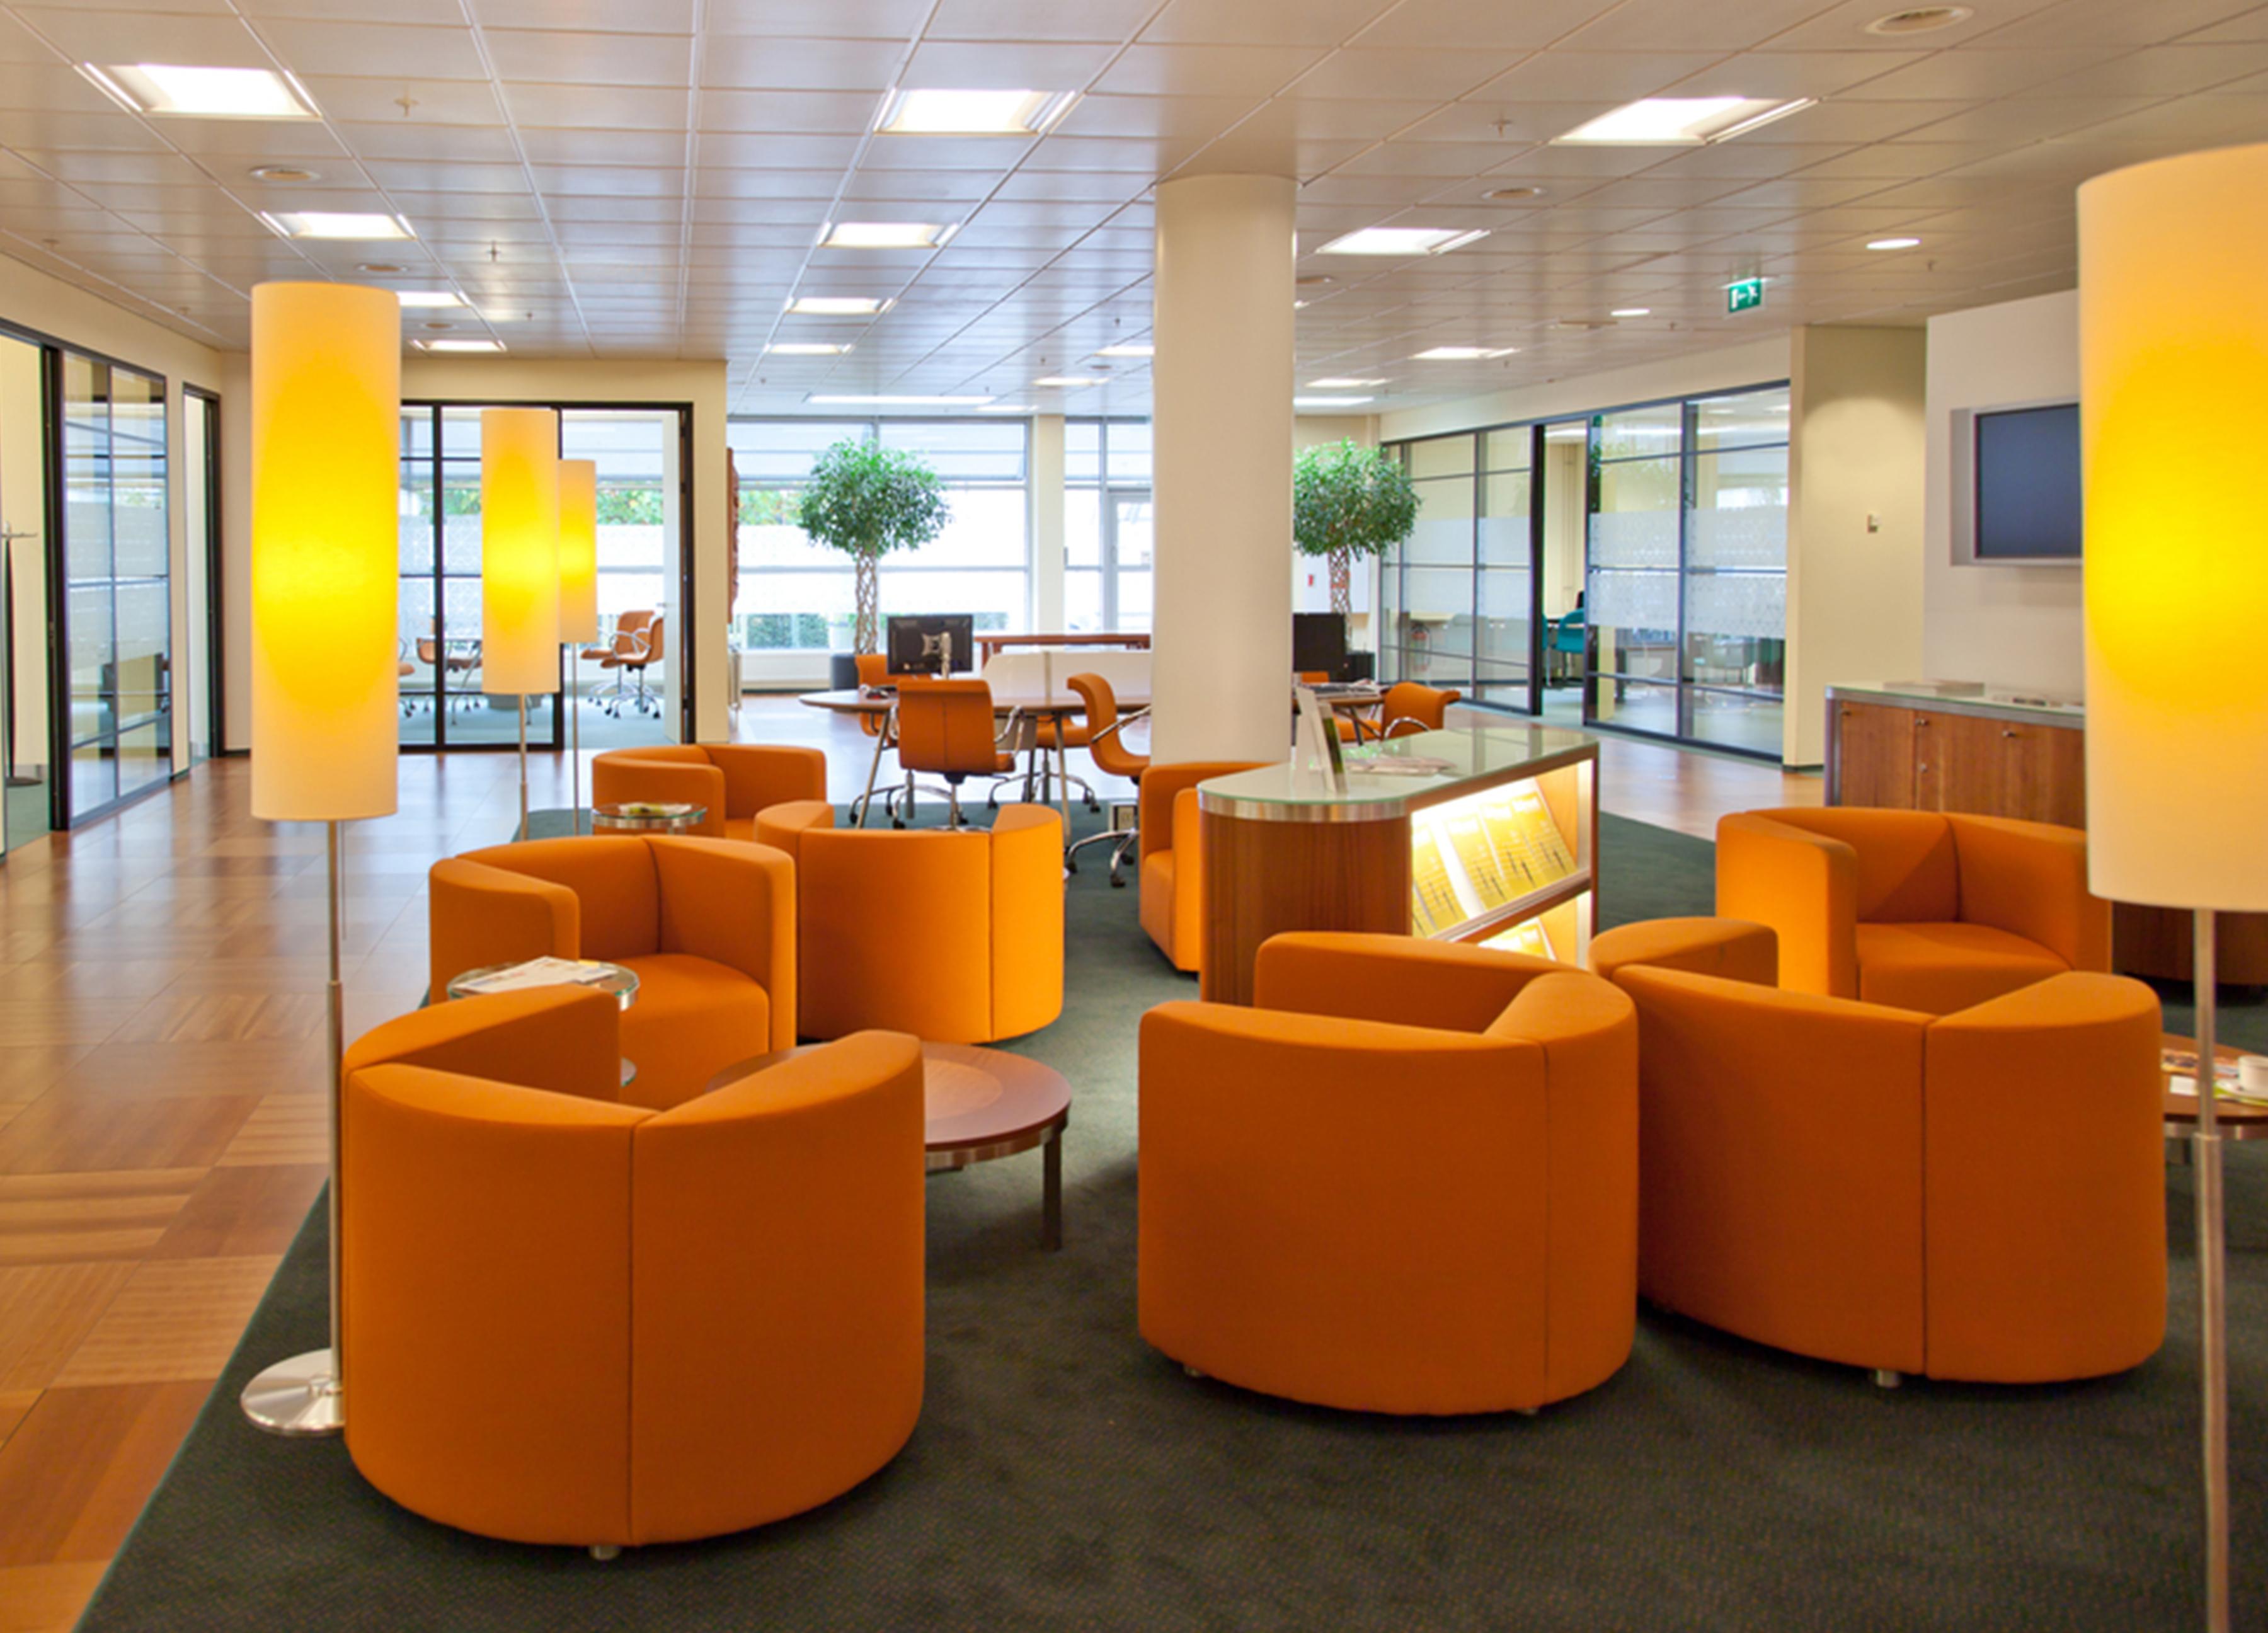 Commercial Vs. Residential Furniture